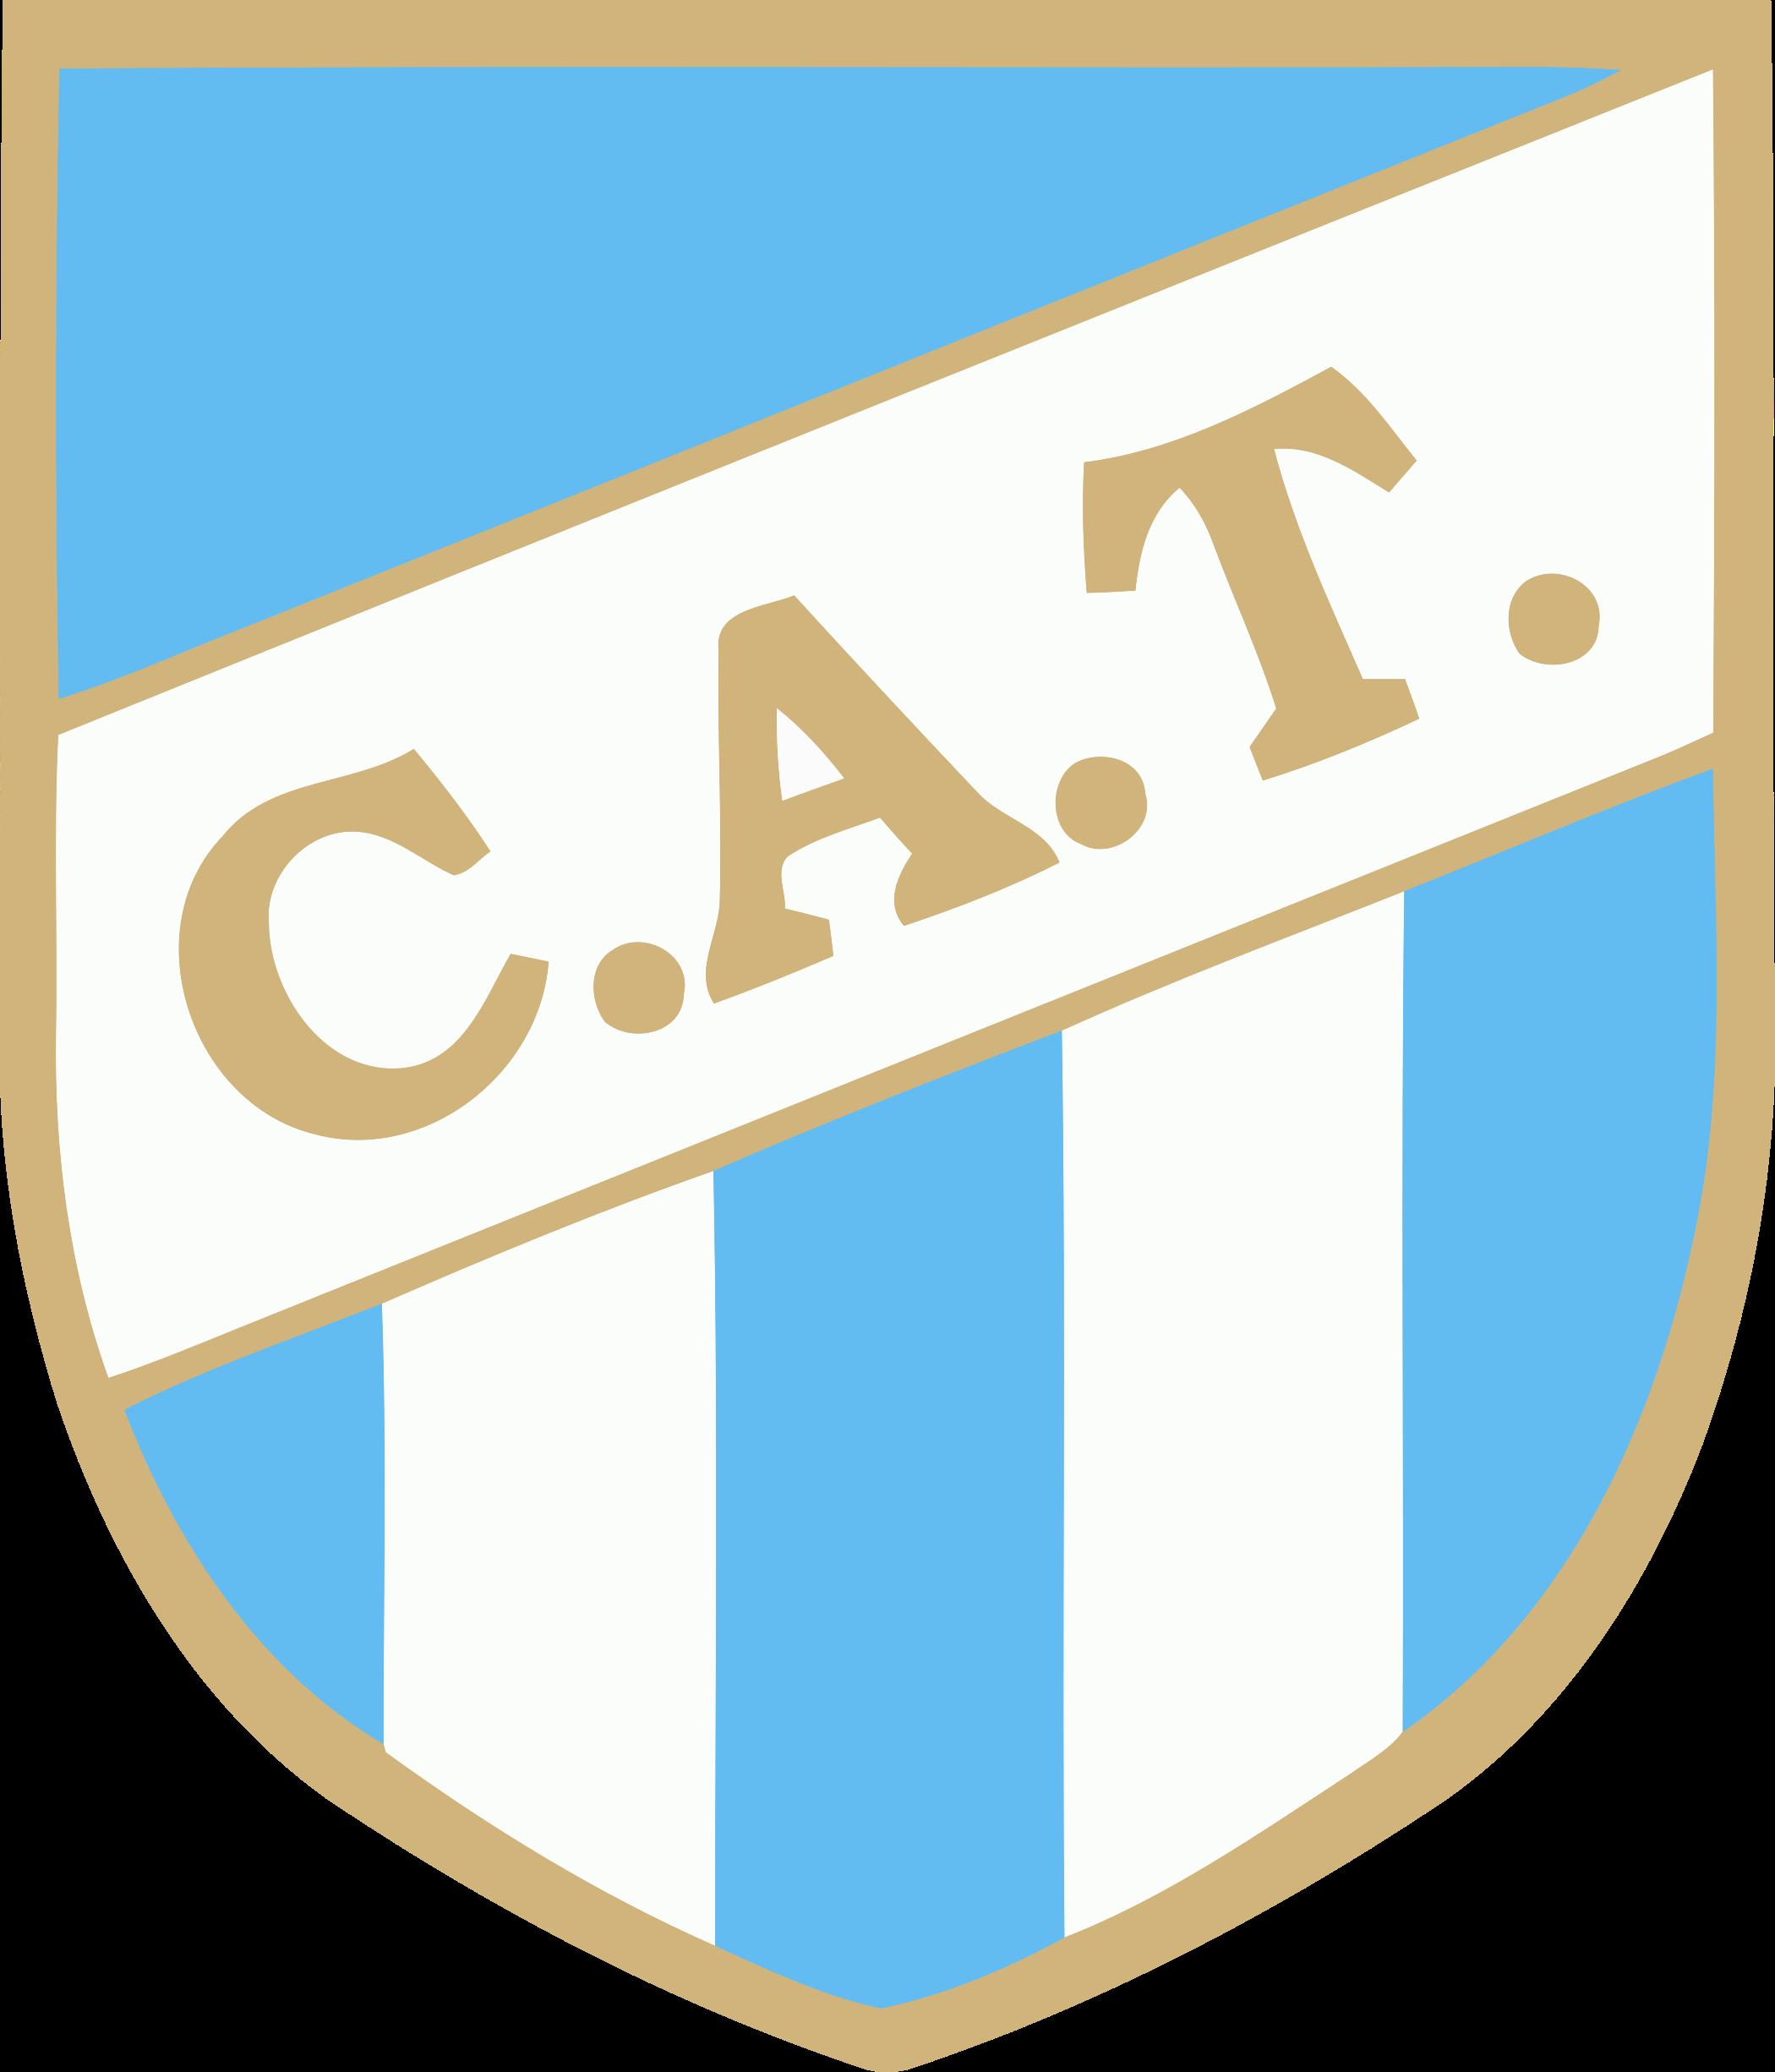 atletico tucuman logo escudo 1 - Club Atlético Tucumán Logo